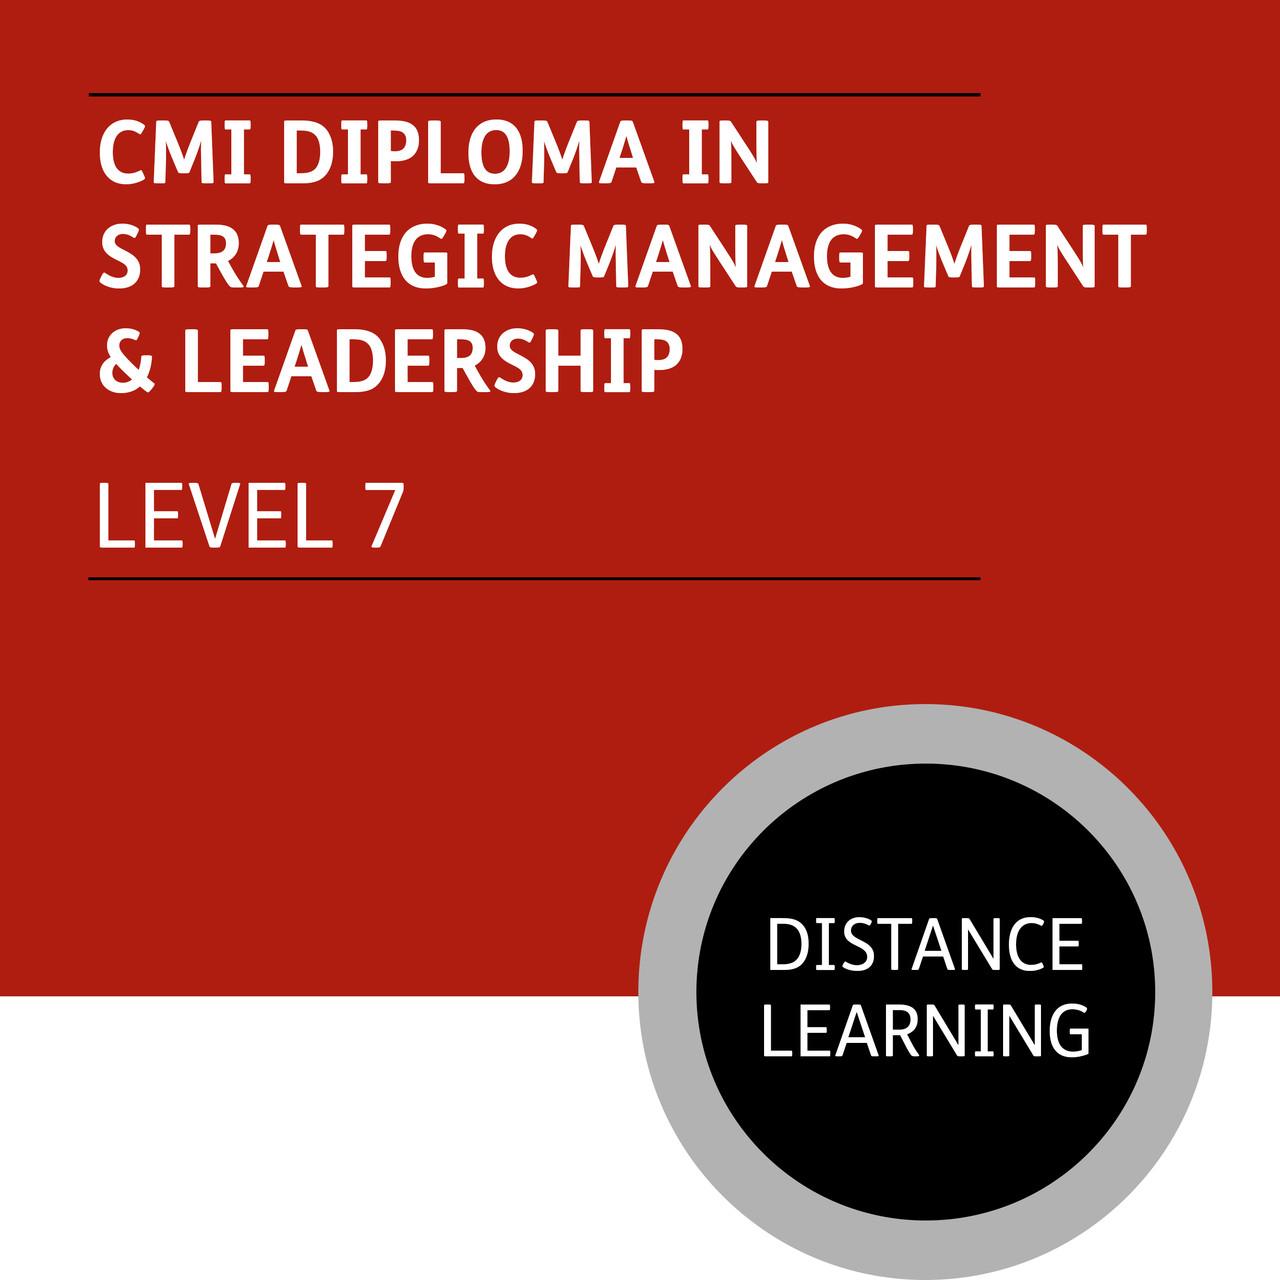 Strategic management and leaderships skills